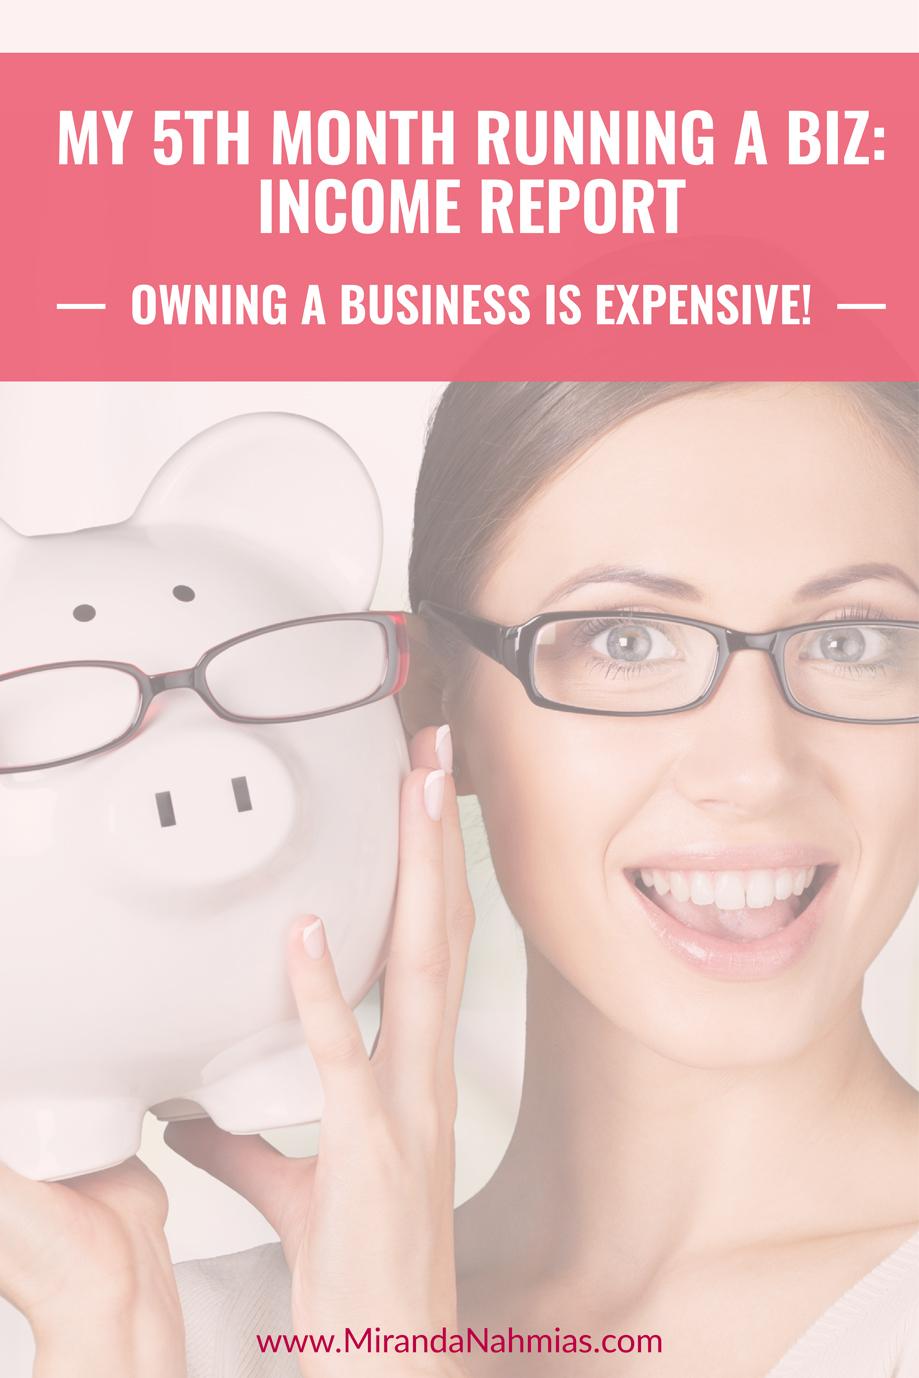 My 5th Month Running a Biz: Income Report // Miranda Nahmias